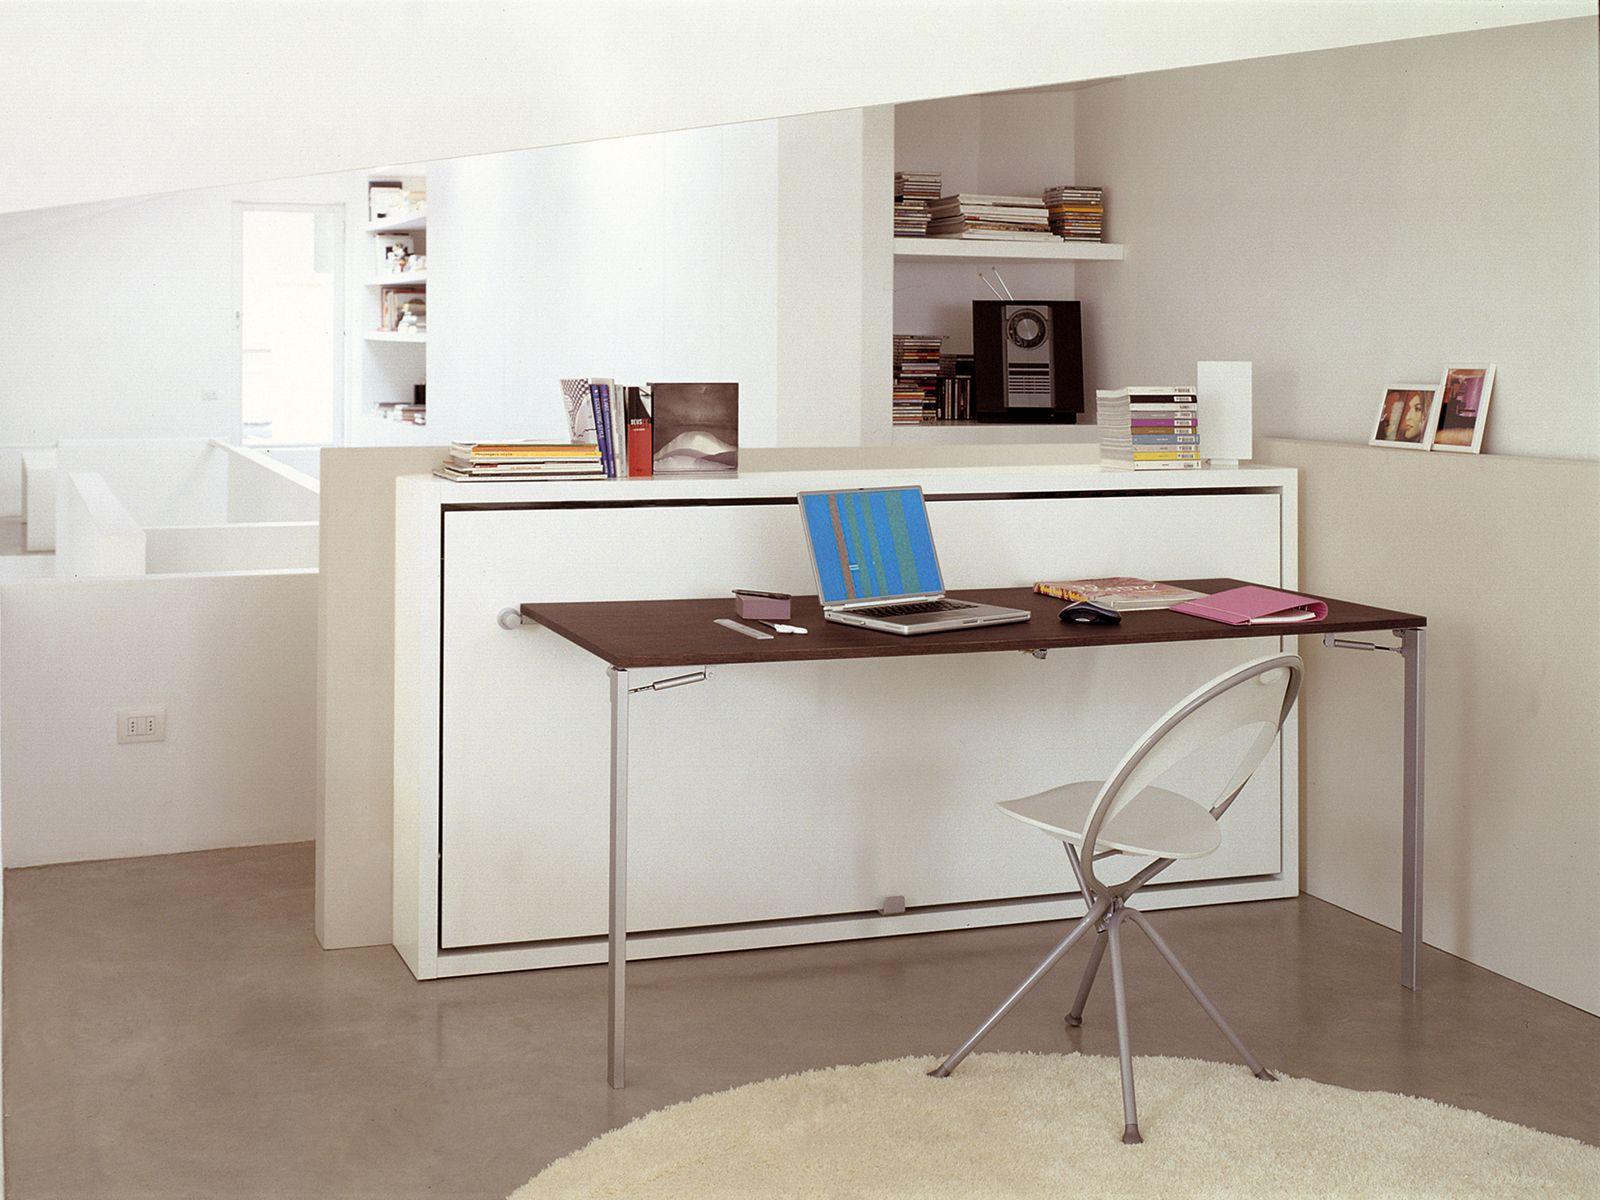 Cama abatible simple poppi desk by clei - Camas abatibles clei ...